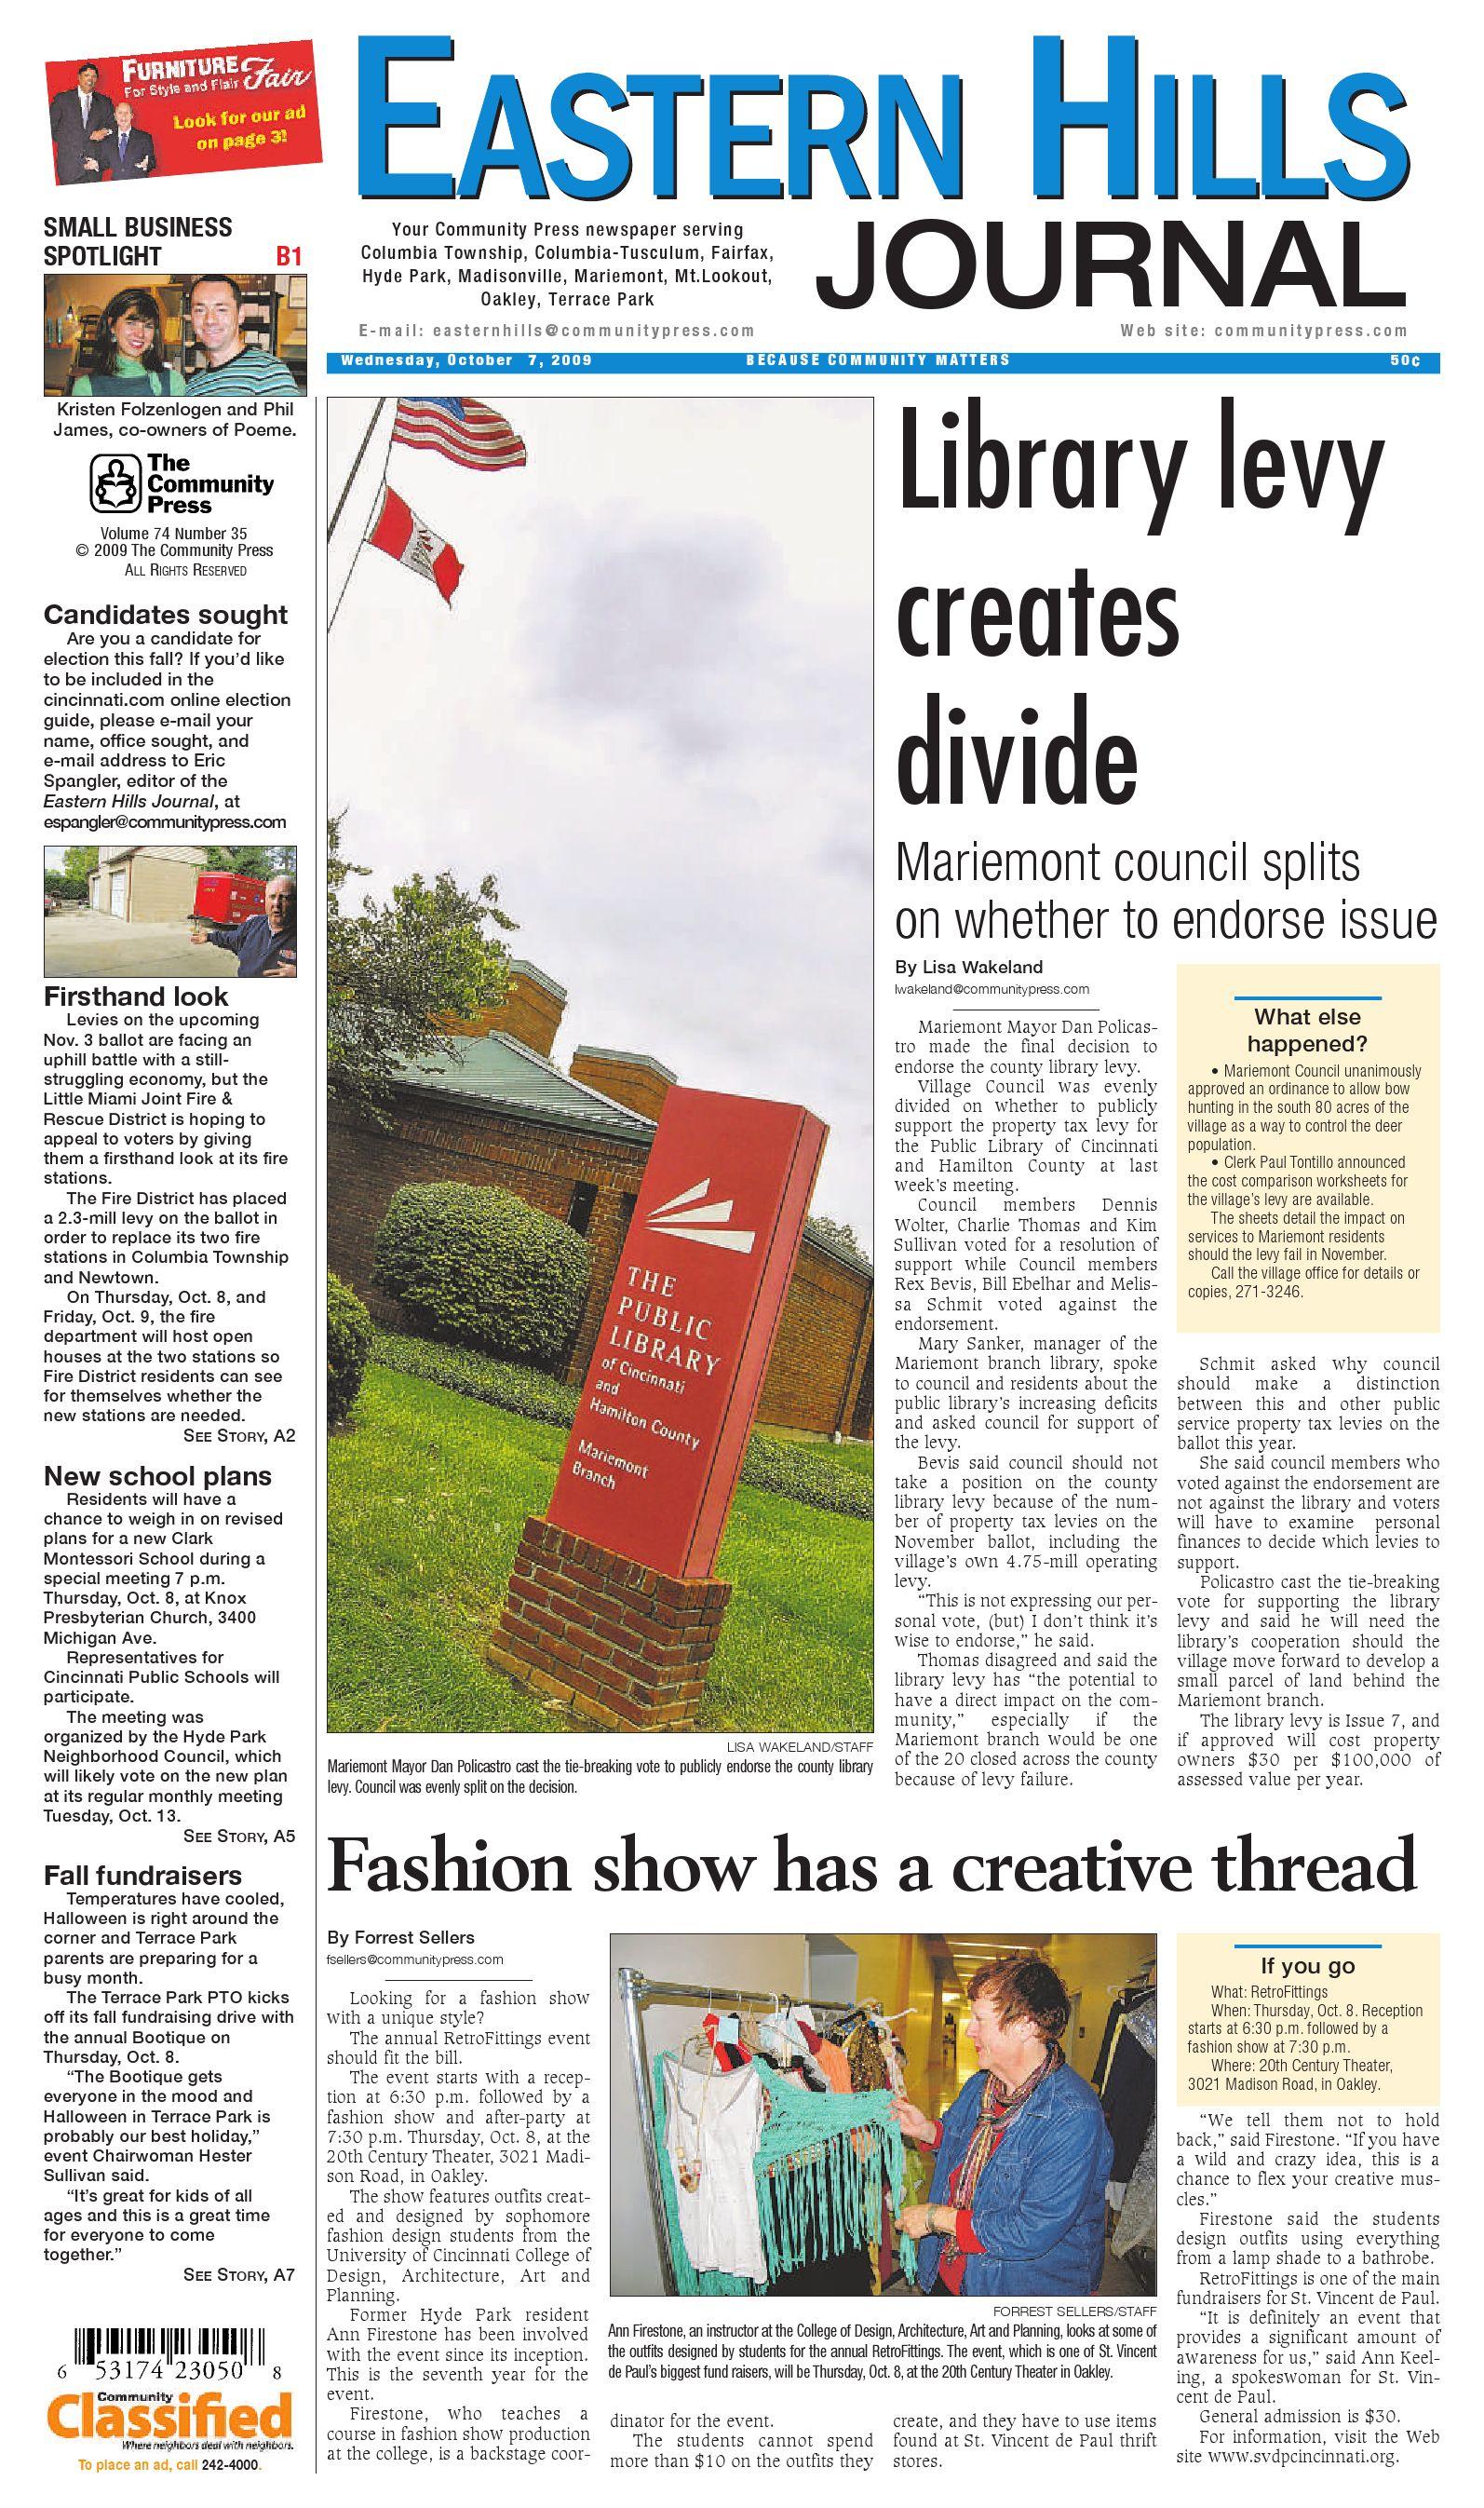 6c67ba40bff Eastern Hills Journal 100709 by Enquirer Media - issuu